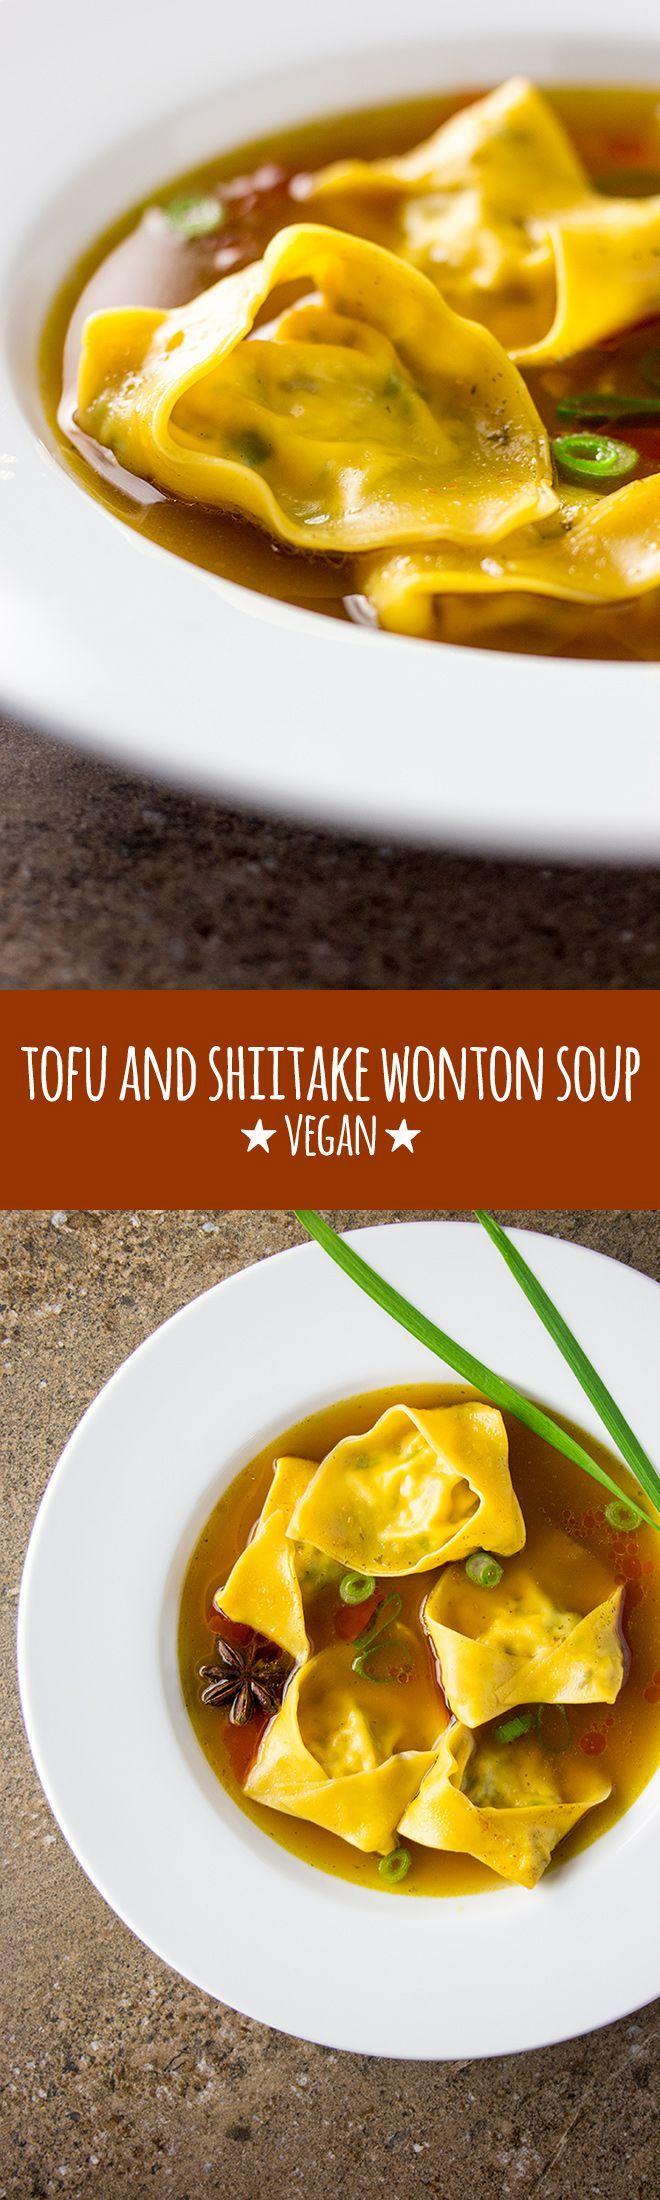 Wonton soup with homemade tofu and shiitake mushroom wontons, swimming in a rich…